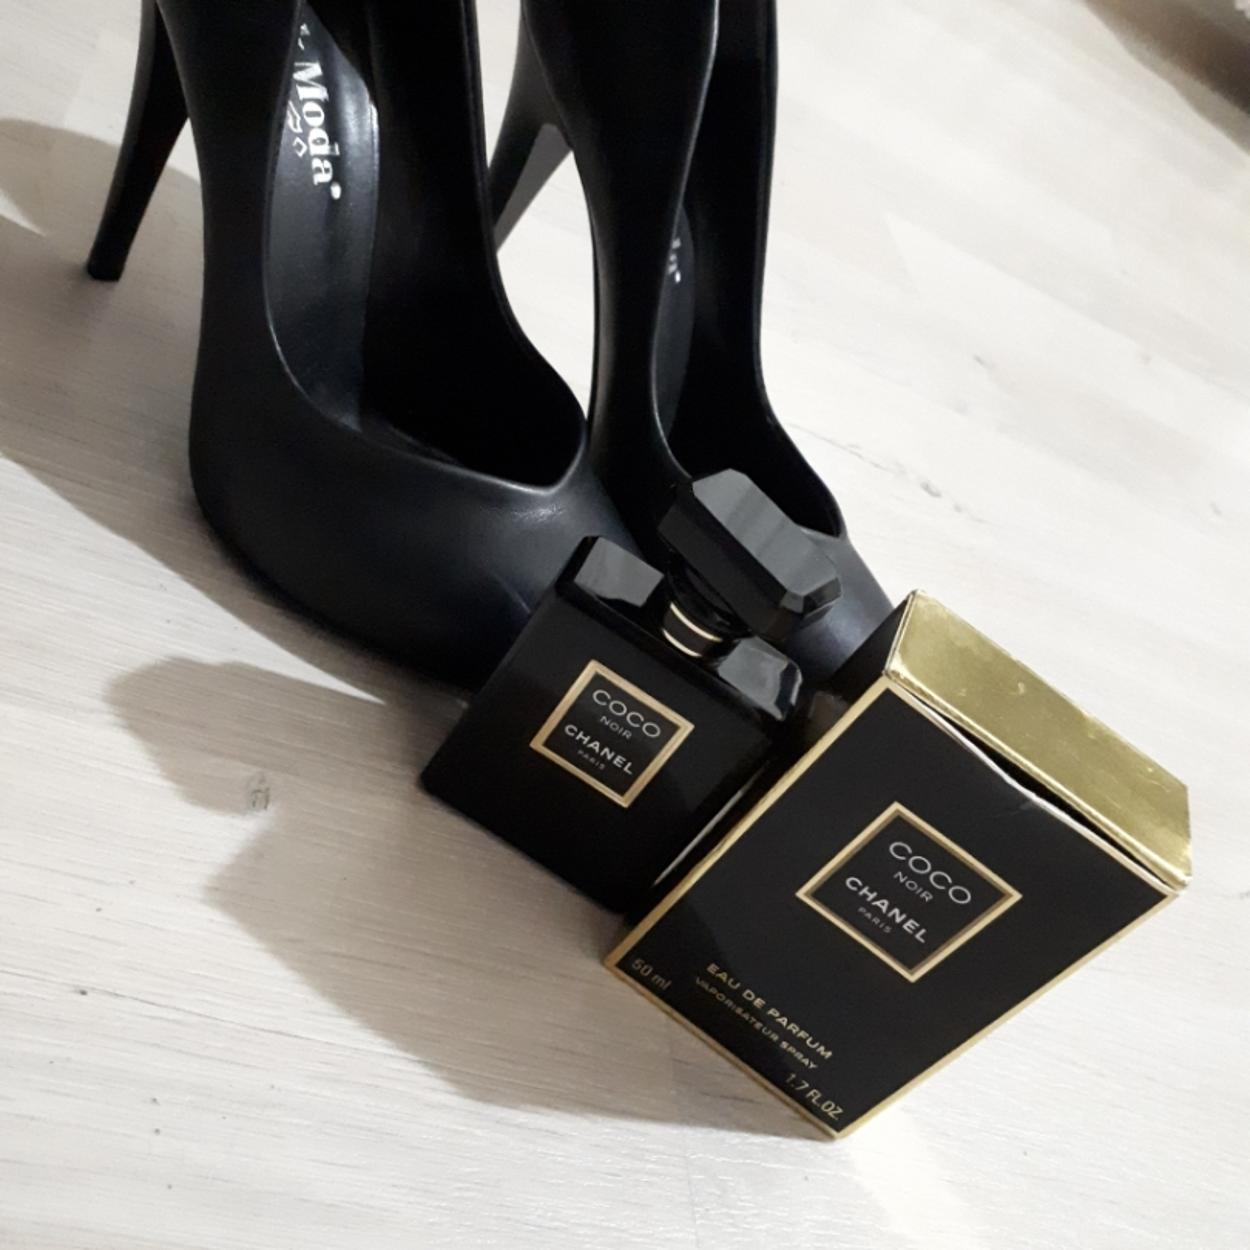 Chanel İnce topuklu